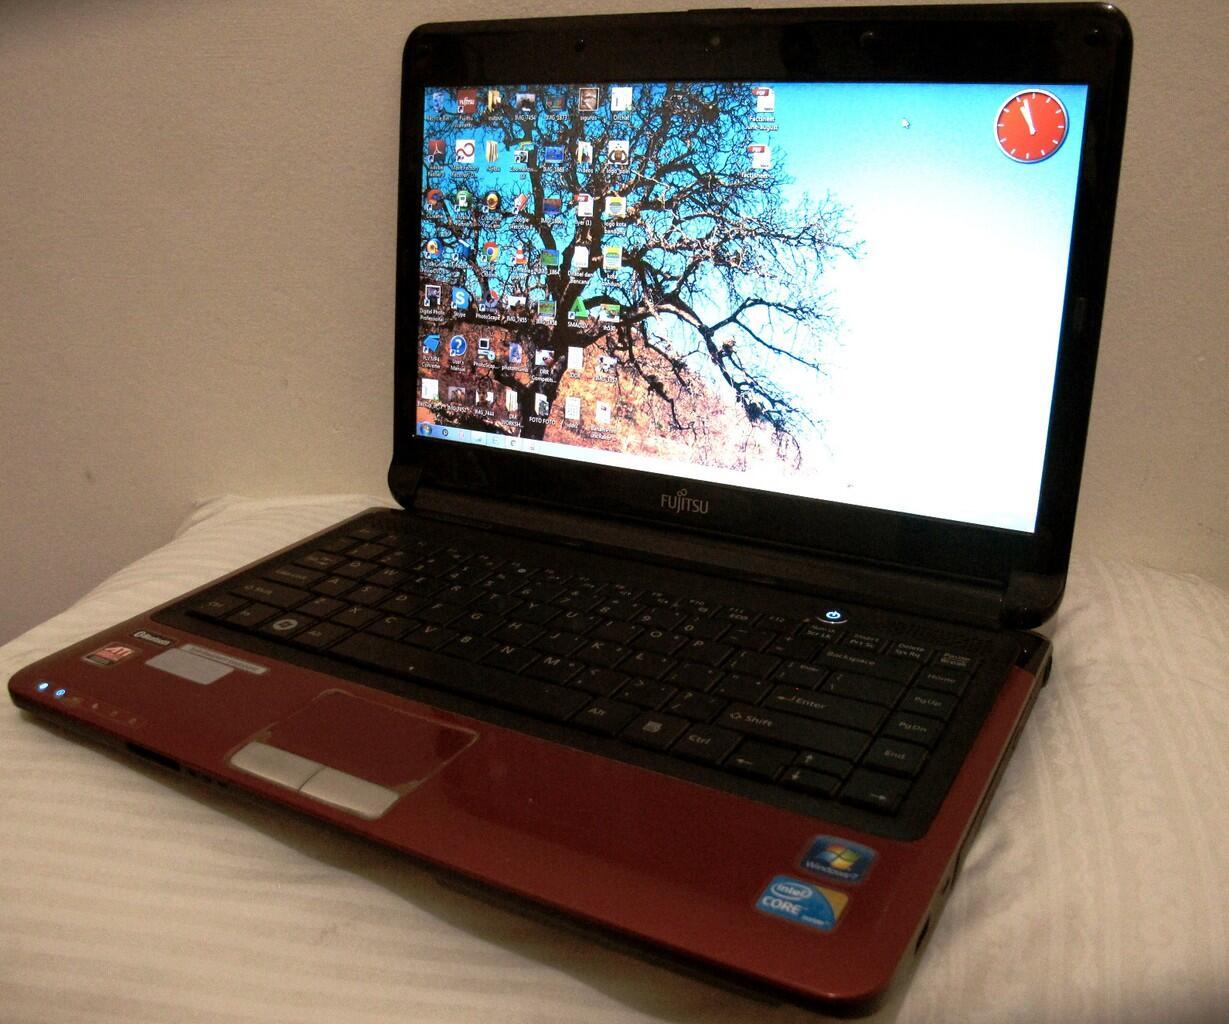 Fujitsu Lifebook LH530 - Laptop Second